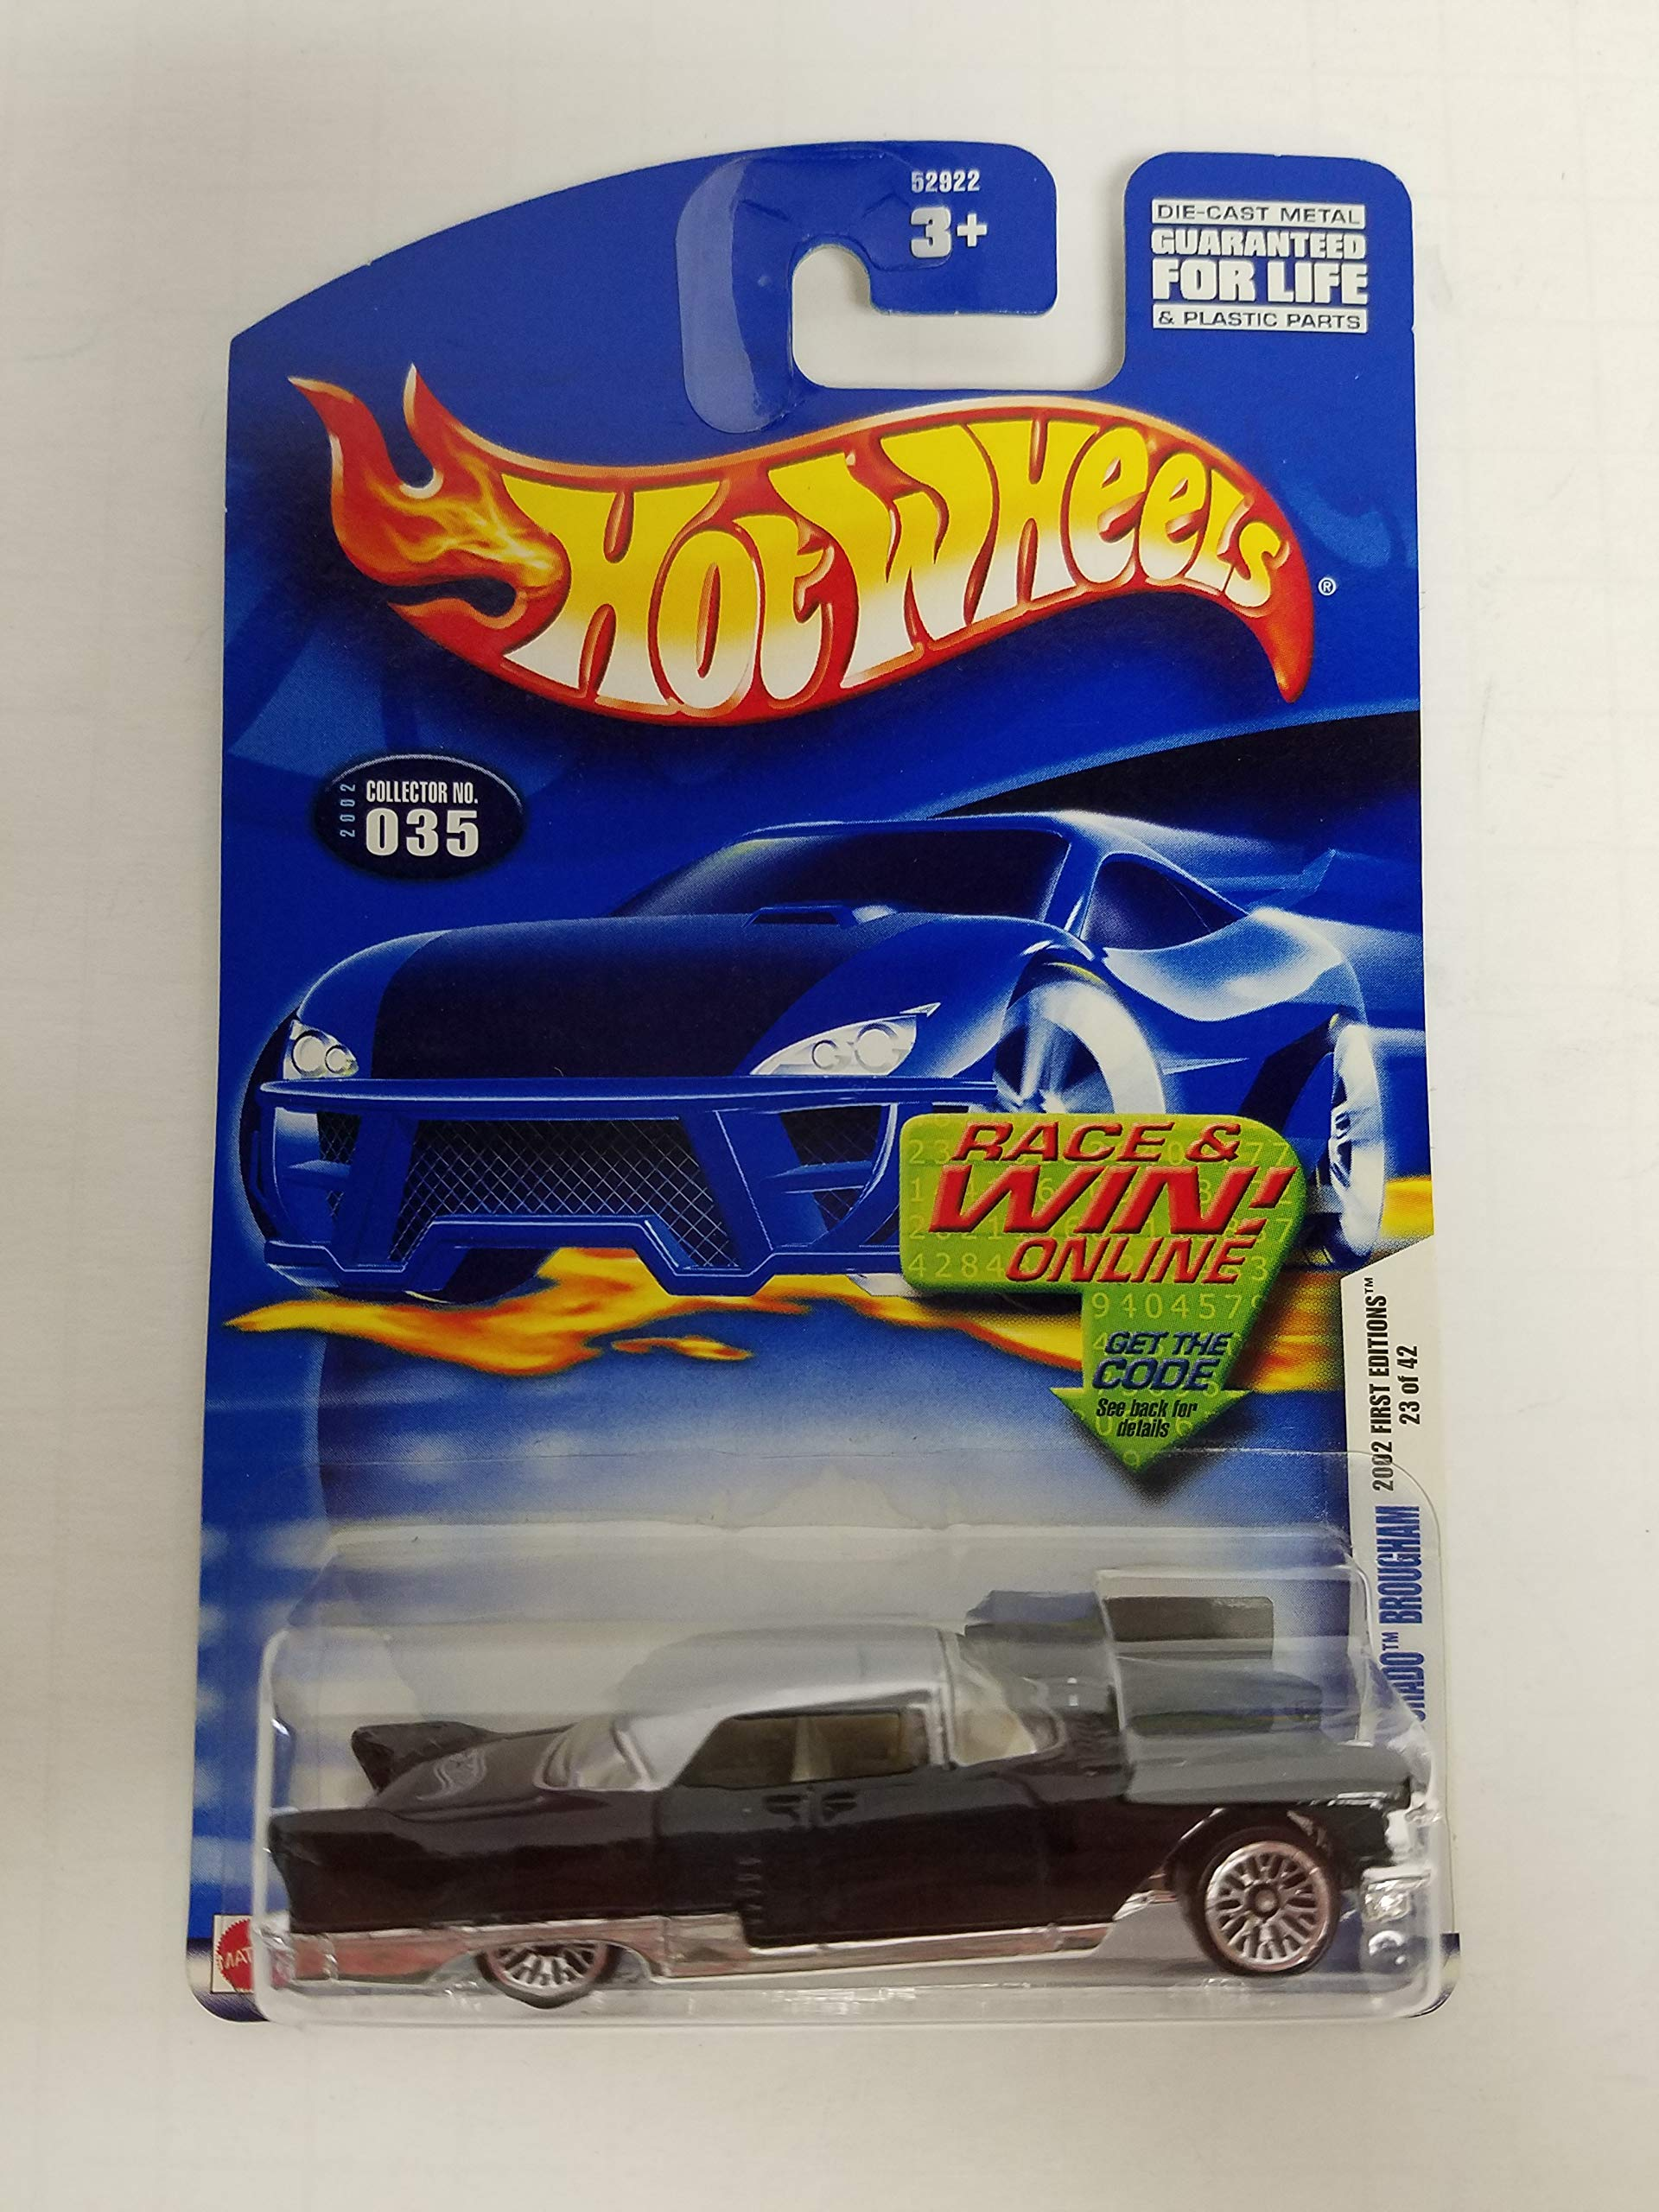 Custom '57 Cadillac El Dorado Bougham Hot Wheels 2002 diecast 1/64 scale car No. 035